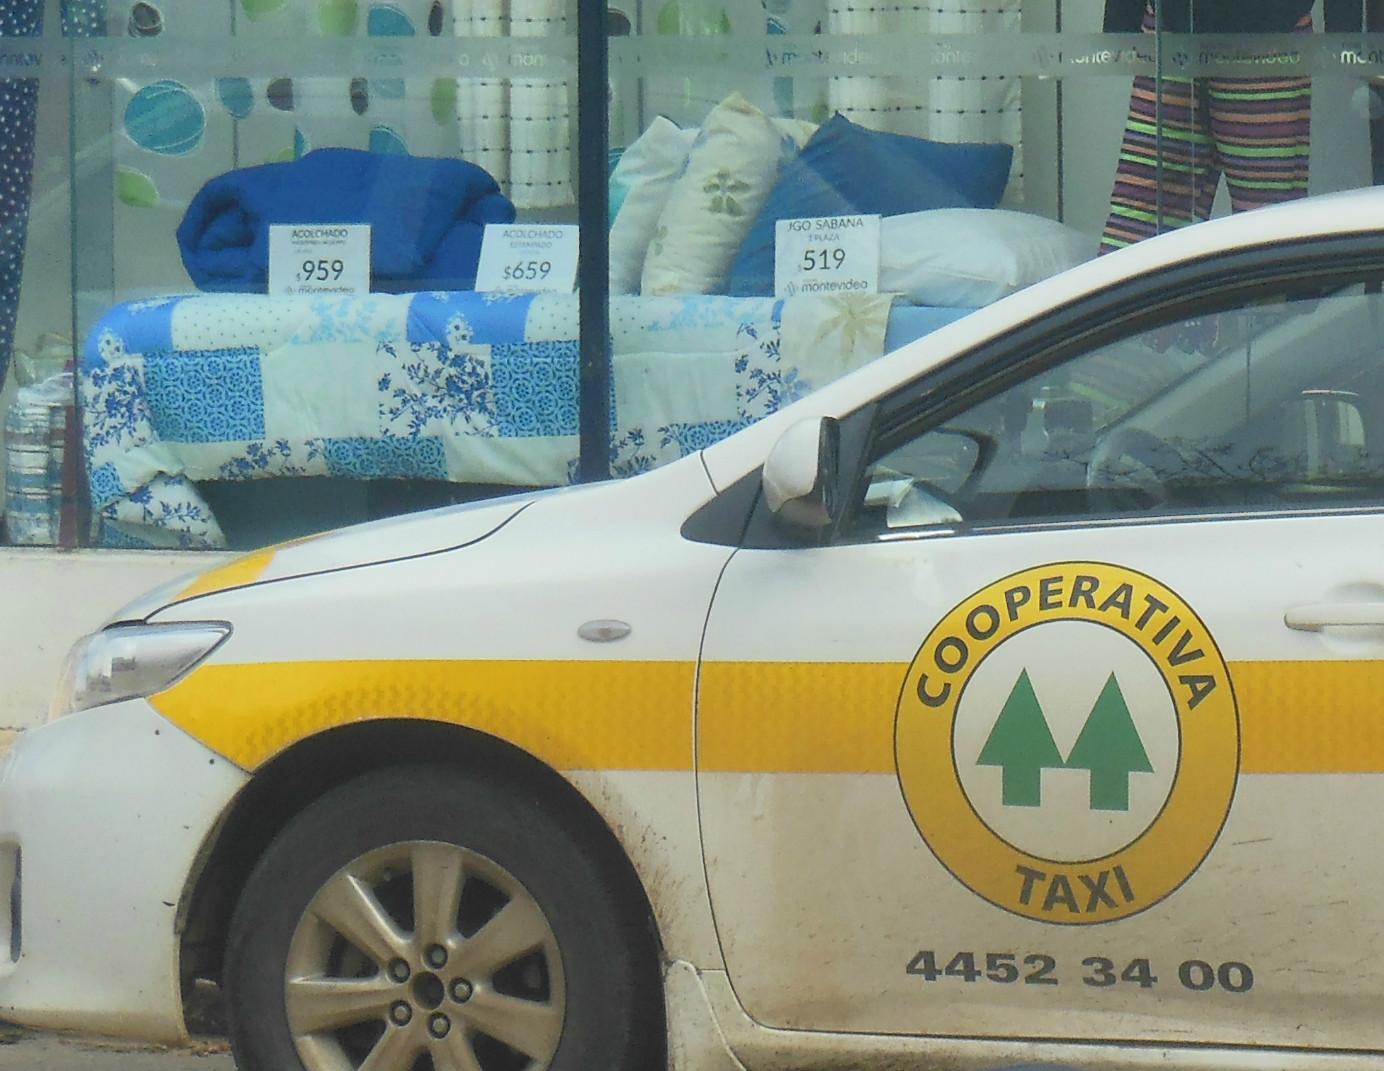 Cooperativa de Taxi